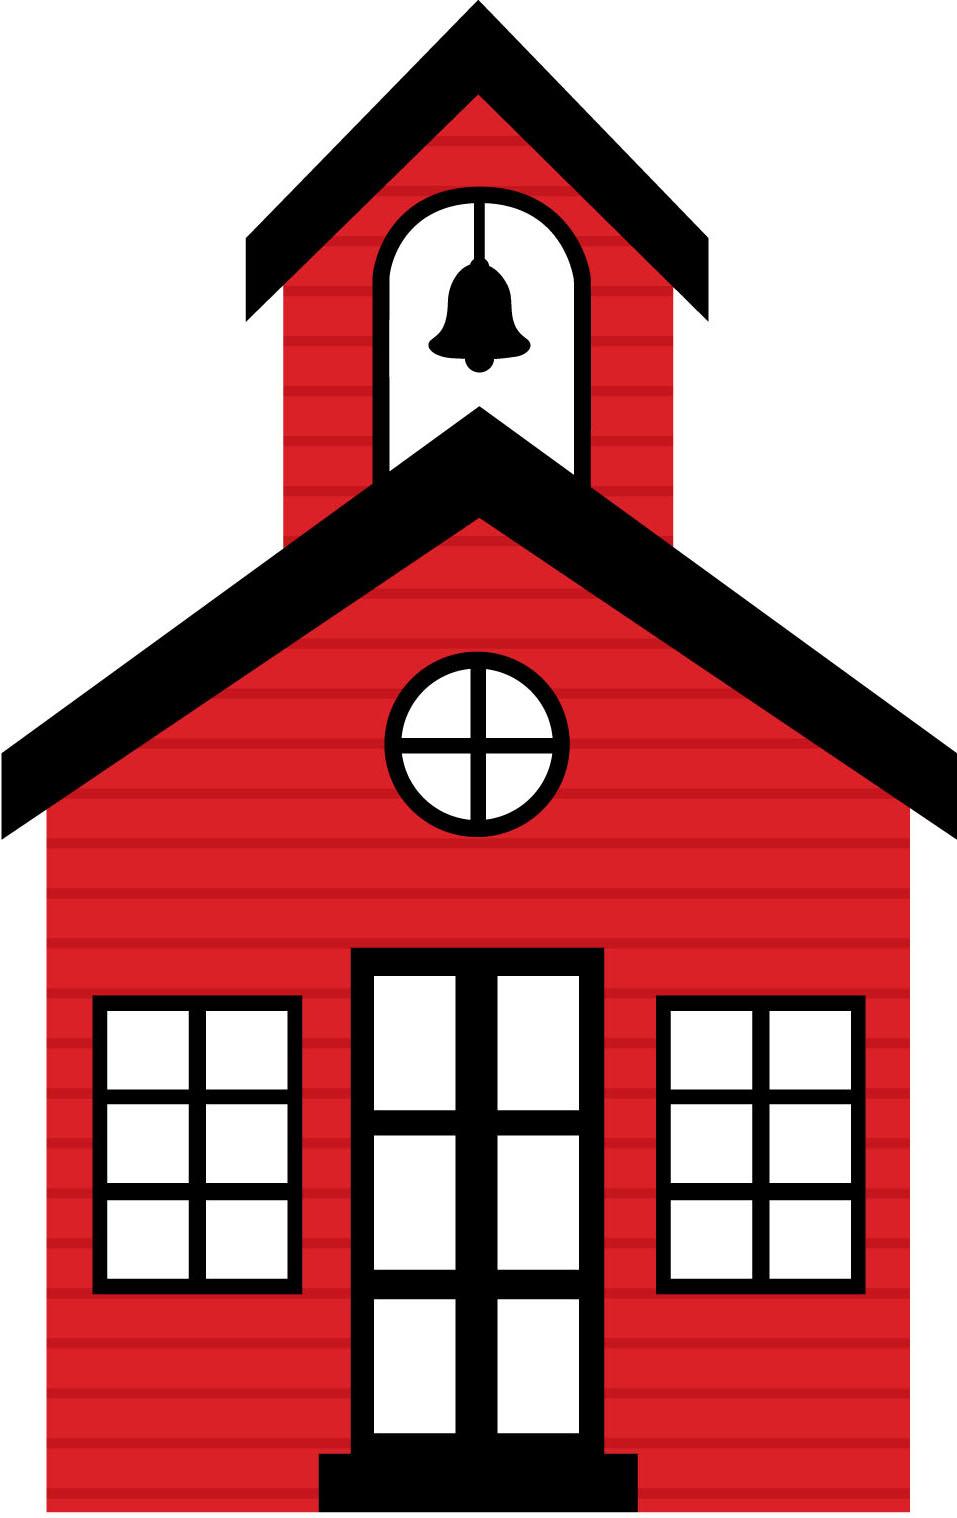 Little red campaign bainbridge. Schoolhouse clipart day care center